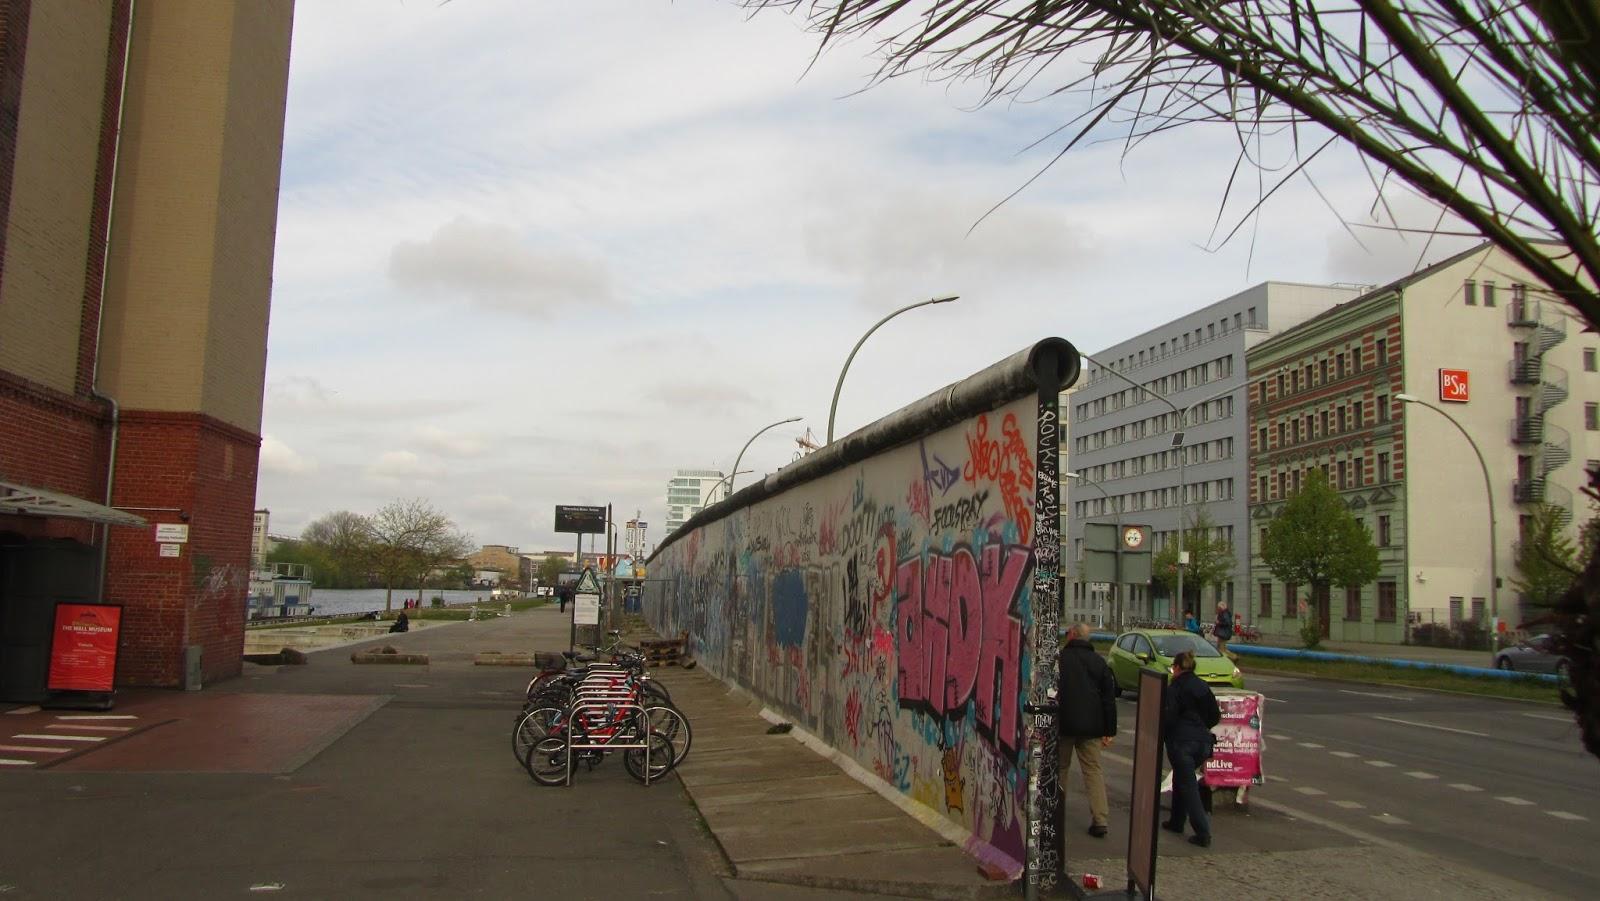 berlin gezilecek yerler berlin duvar ve east side gallery. Black Bedroom Furniture Sets. Home Design Ideas